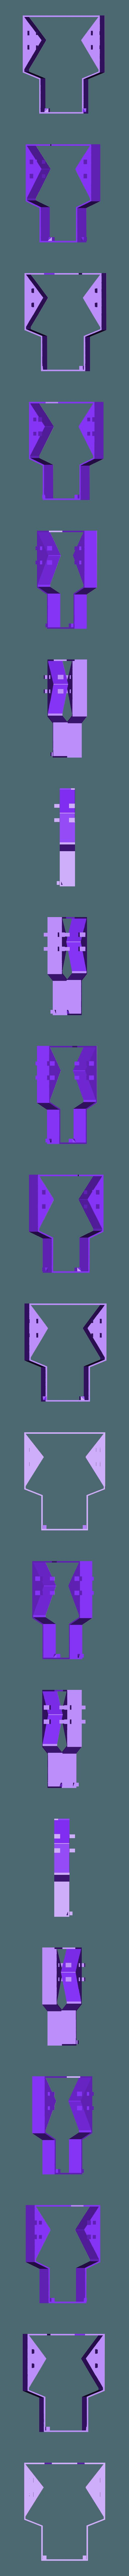 3.stl Download free STL file MARBLE BOY automat • 3D printer object, Janis_Bruchwalski